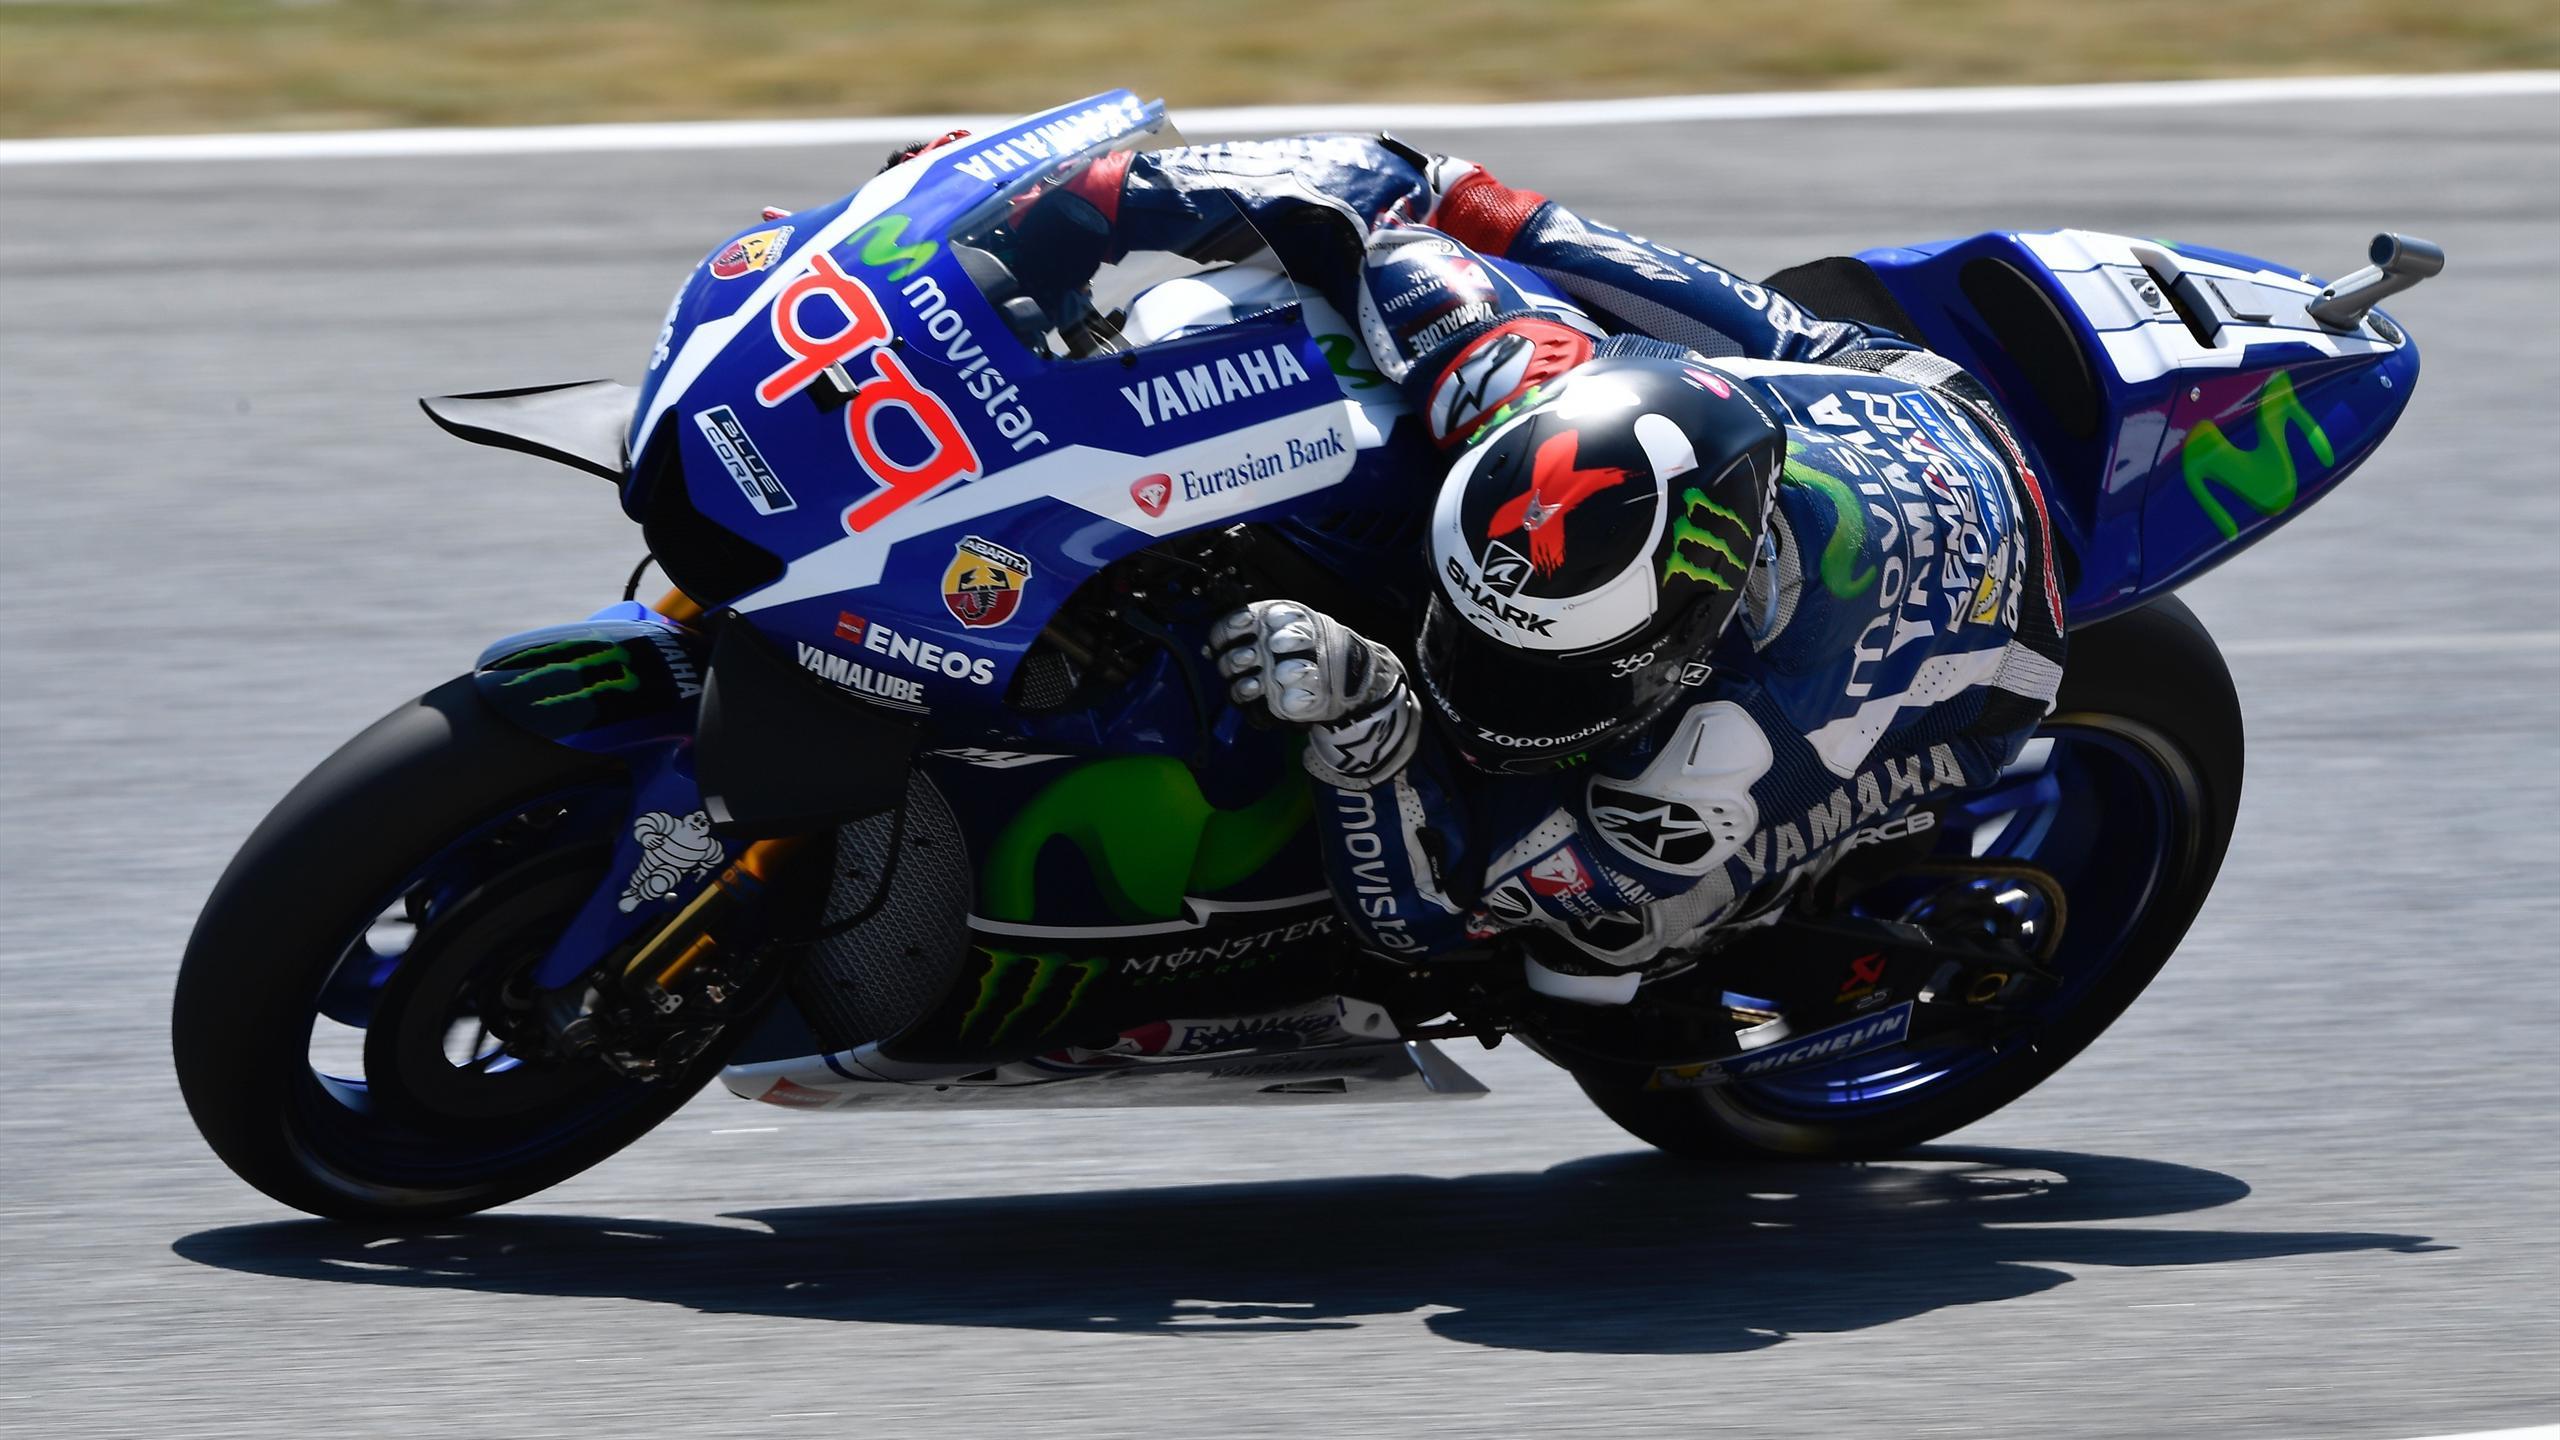 Jorge Lorenzo (Yamaha Factory) - GP of Catalunya 2016